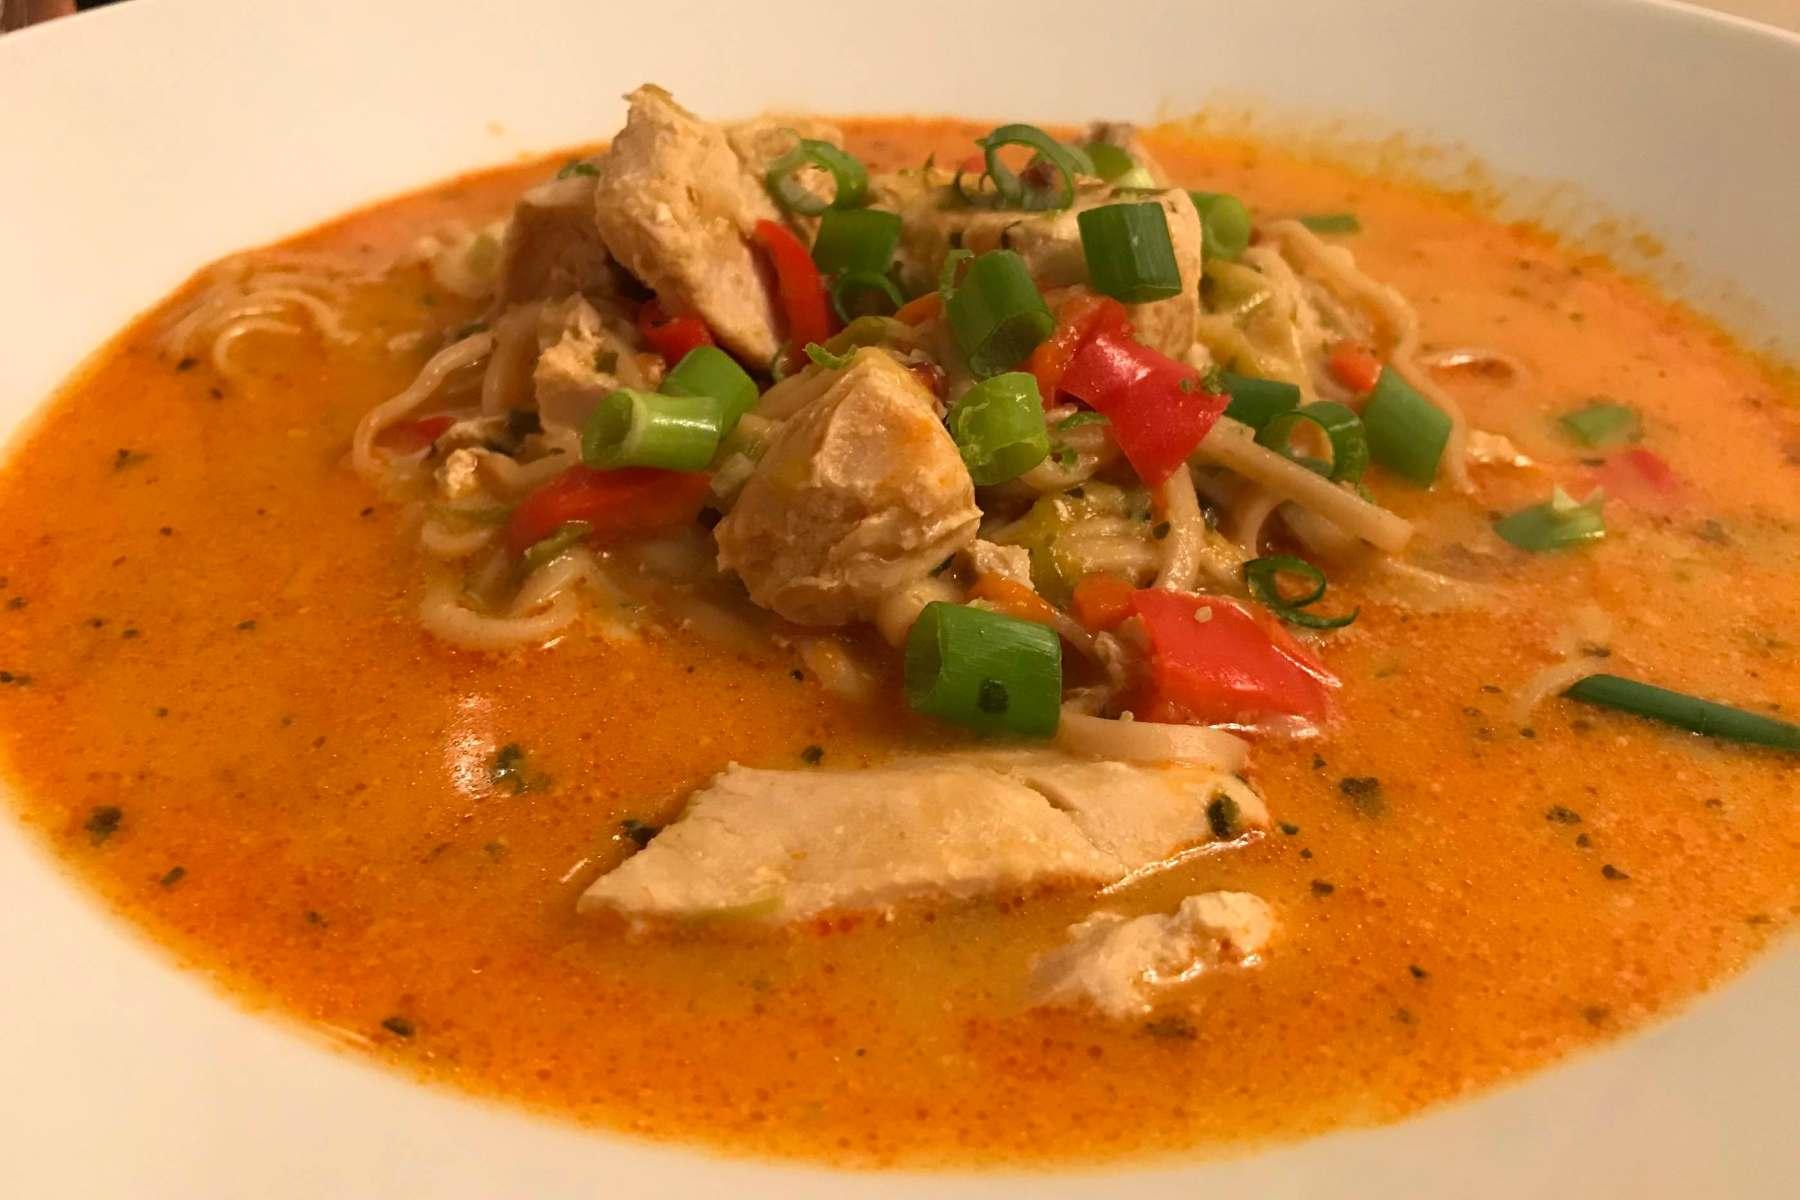 Chicken and Noodle Laksa soup